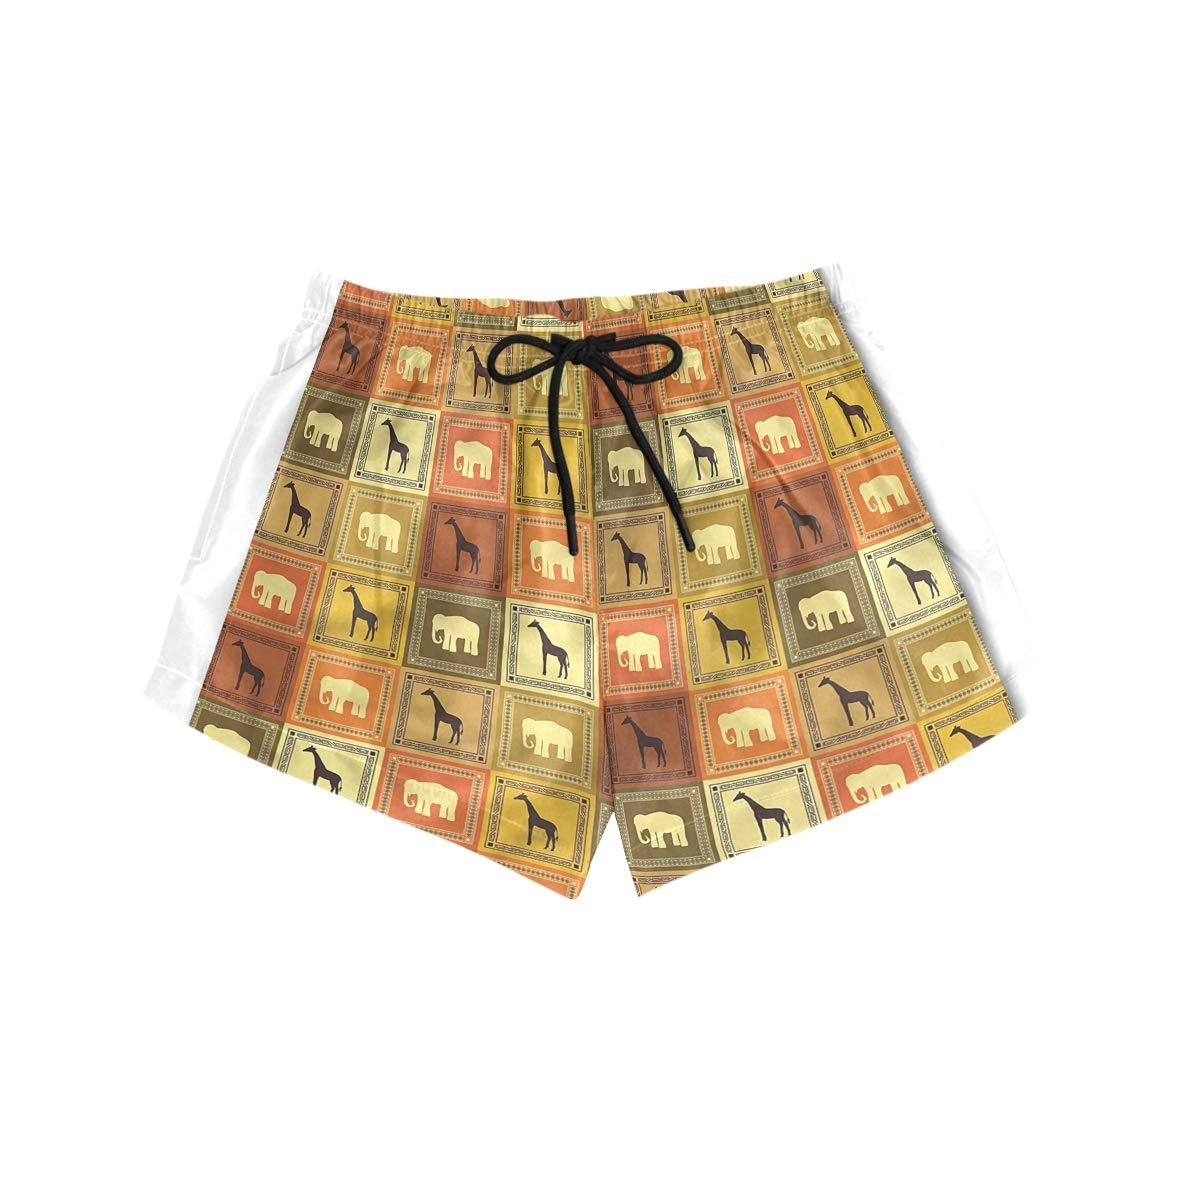 YOLOLIS Women Summer Boardshorts Quick Dry Swimwear Workout Shorts Printed Savanna Animal Frames M